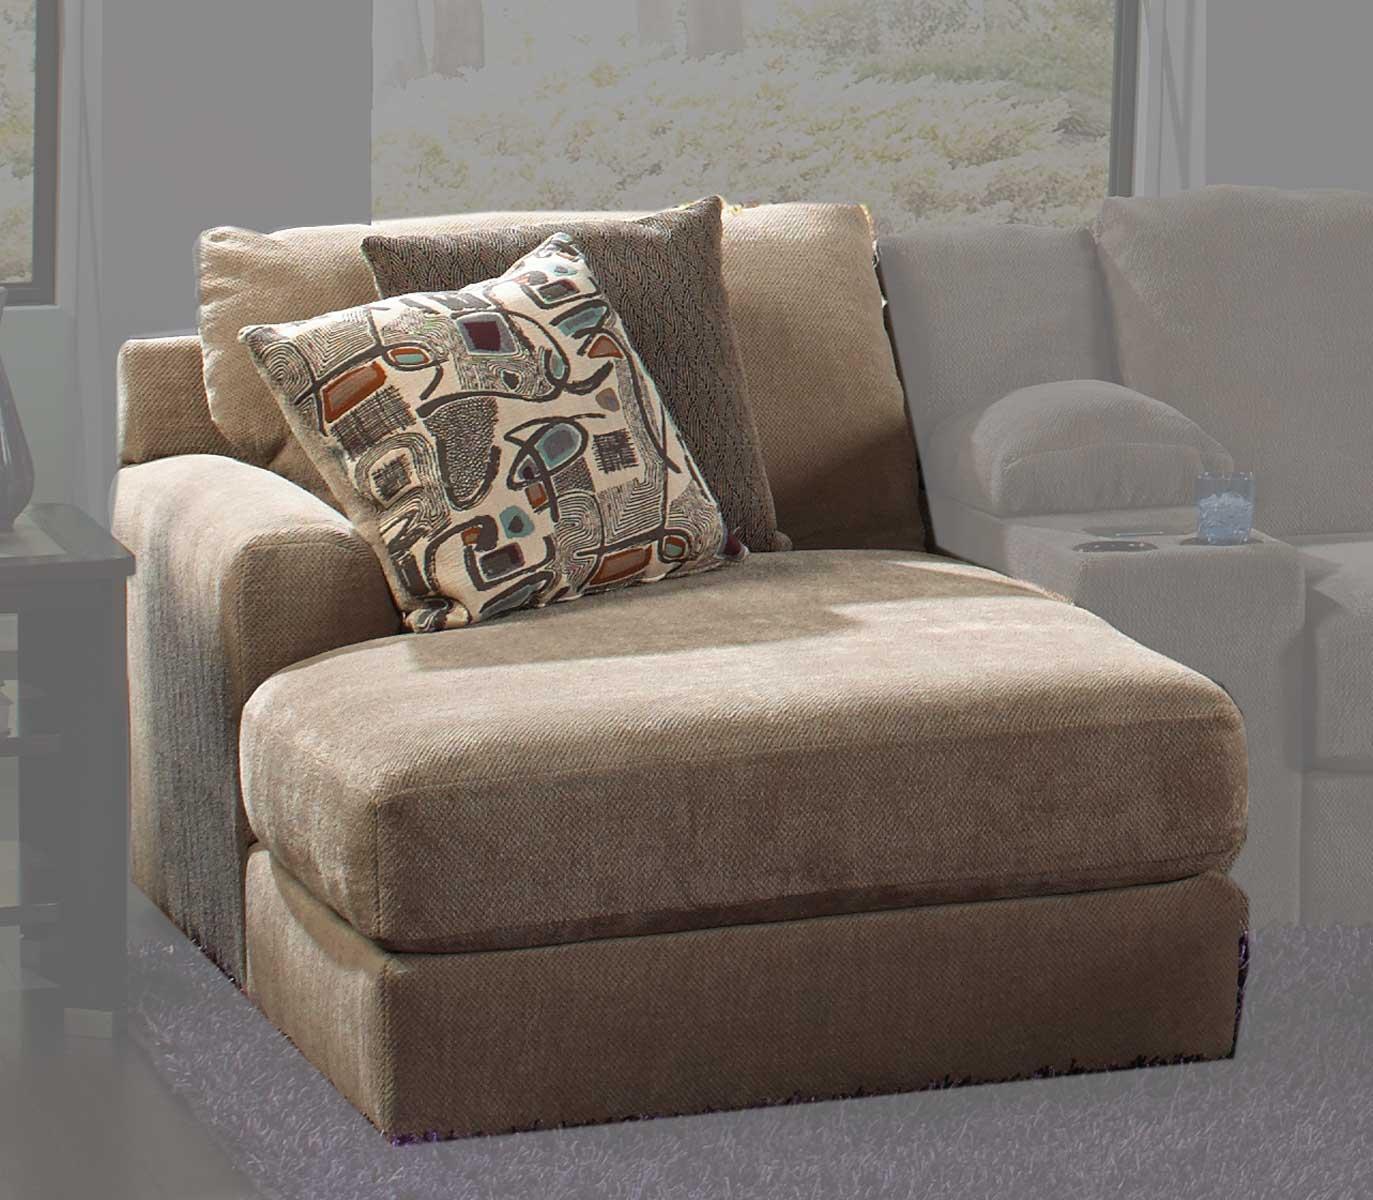 jackson malibu small piano wedge sectional jf 3239 set 3. Black Bedroom Furniture Sets. Home Design Ideas